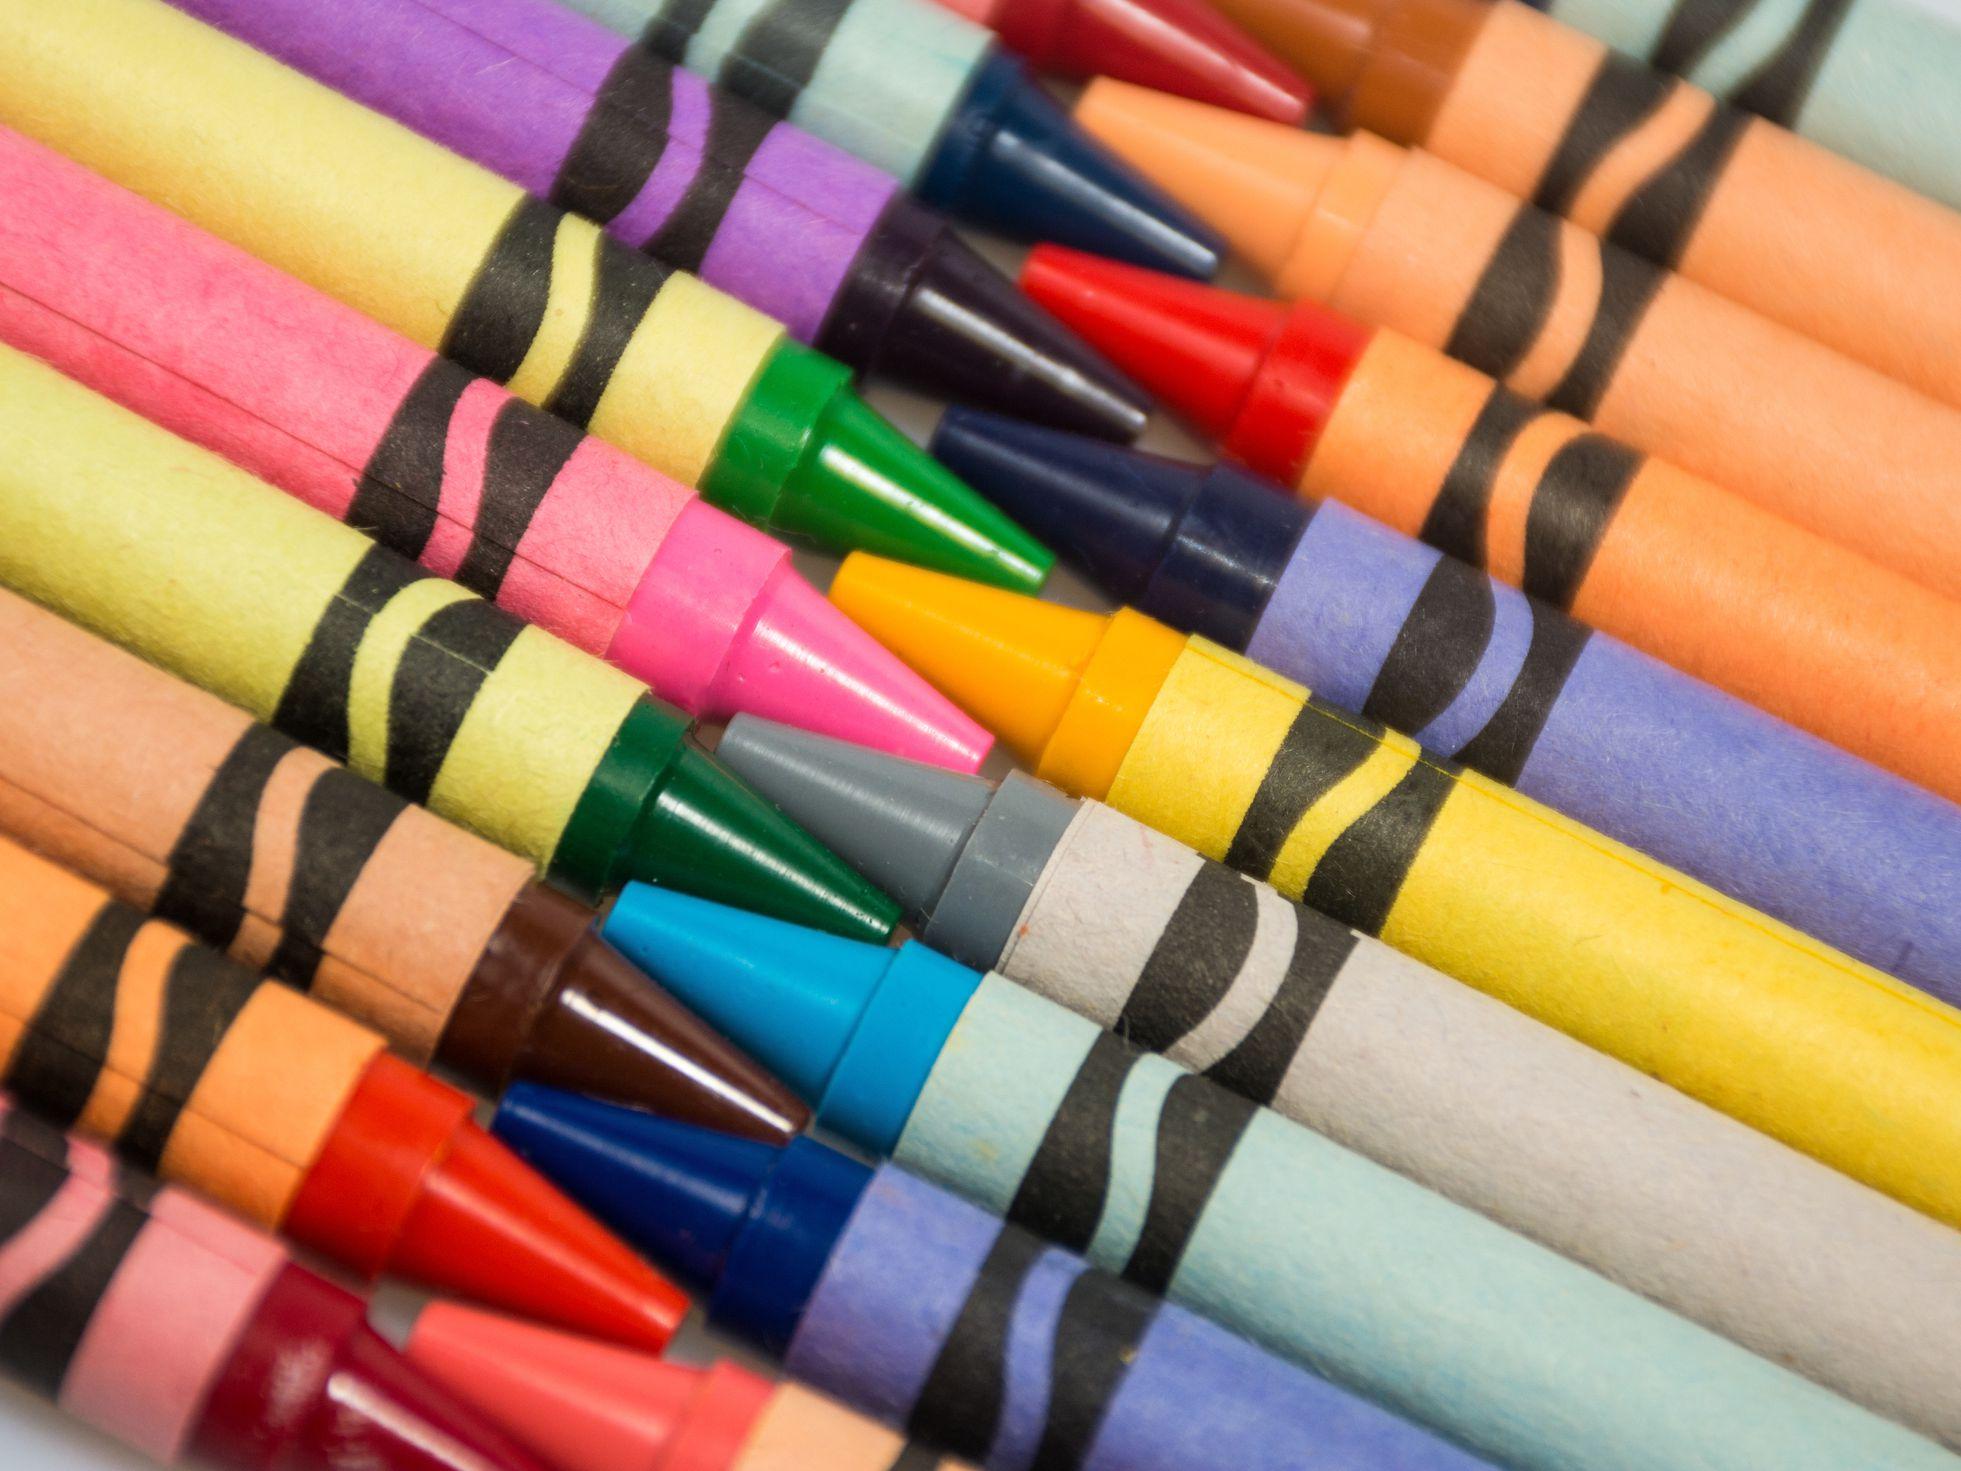 The History Behind Crayola Crayons